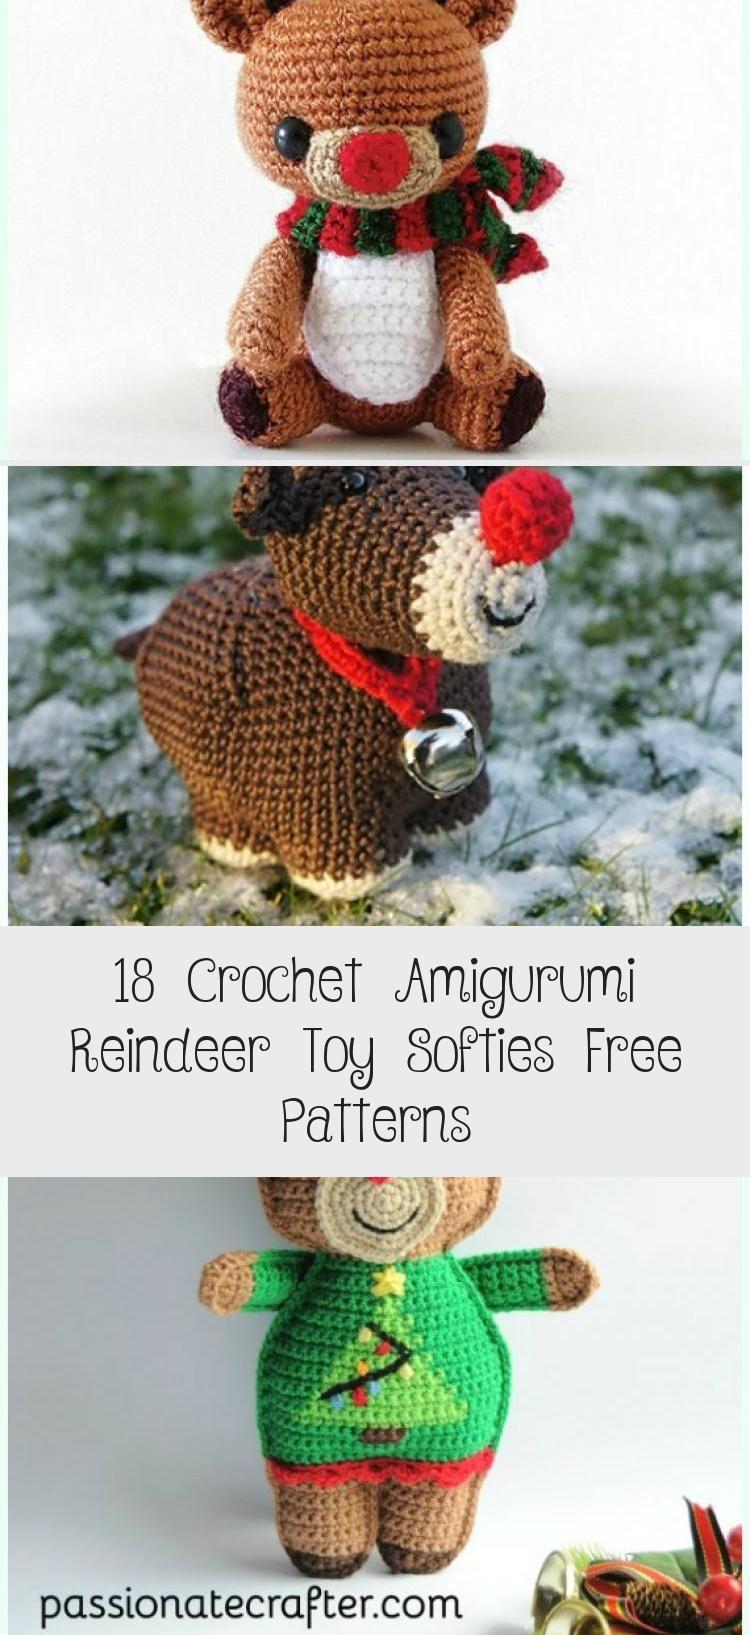 Crochet Small Reindeer Softies Free Pattern - Crochet Amigurumi Deer Toy Softies...